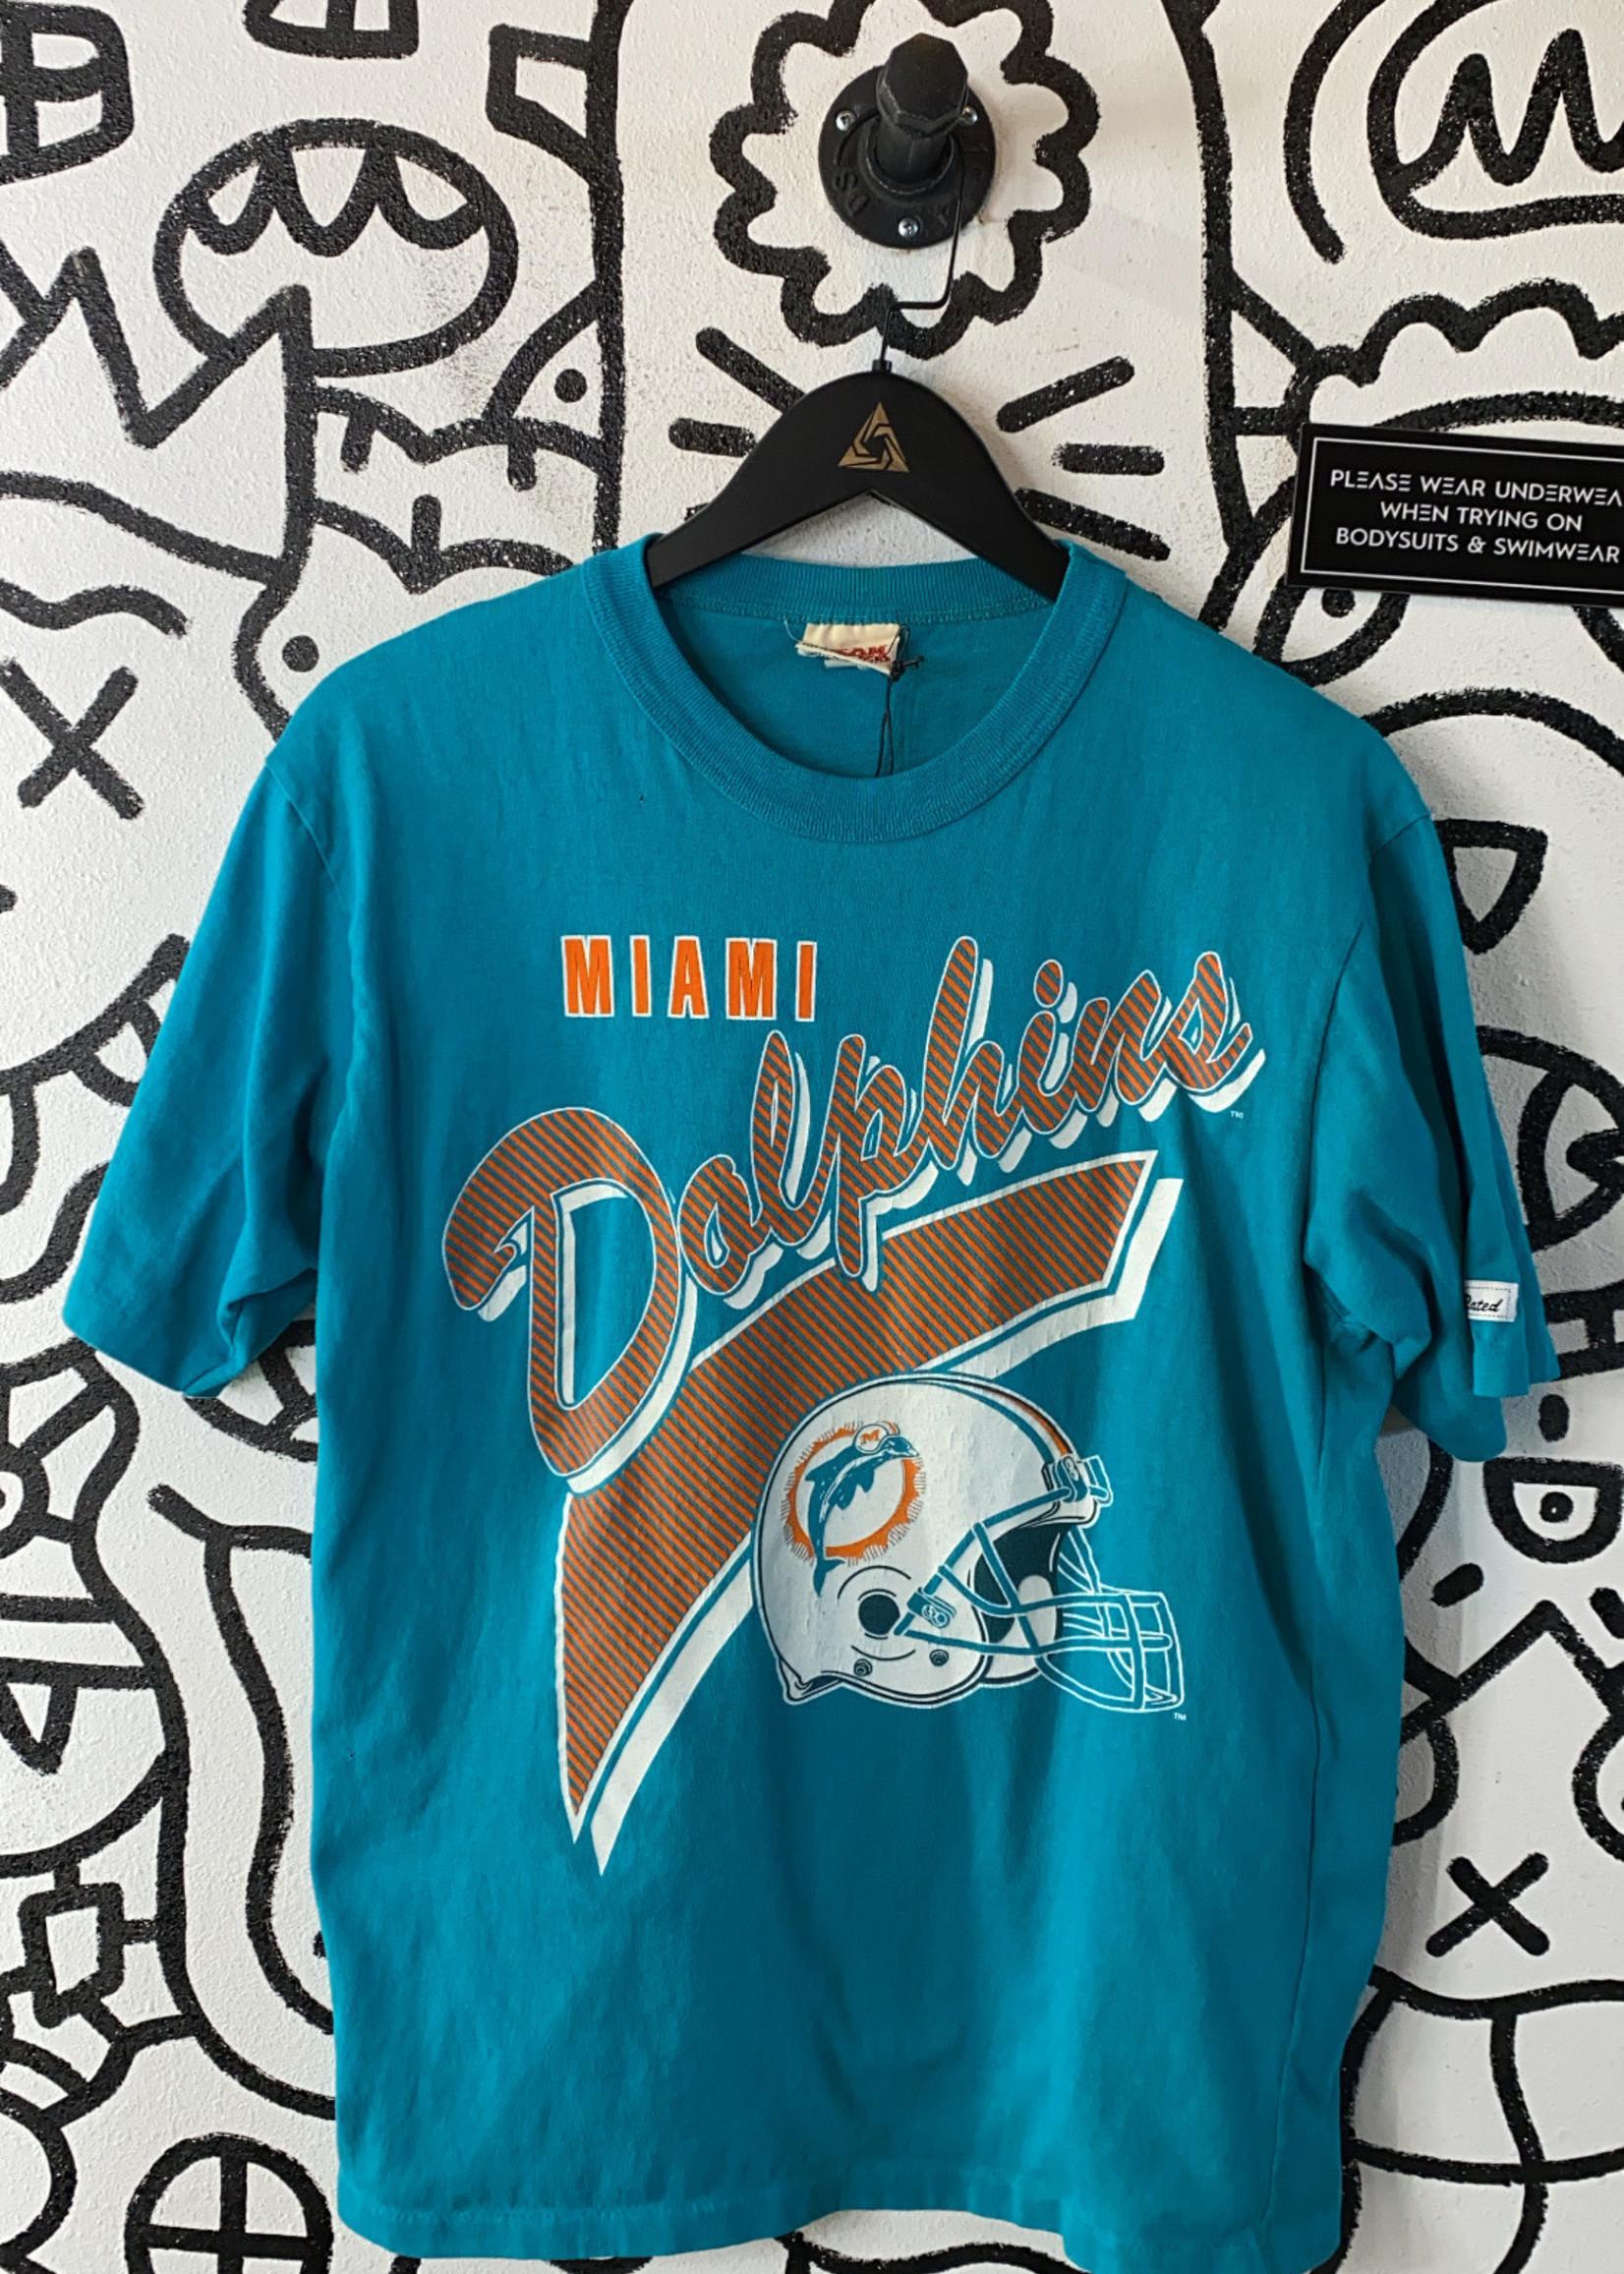 Vintage Miami Dolphins Teal Tee M